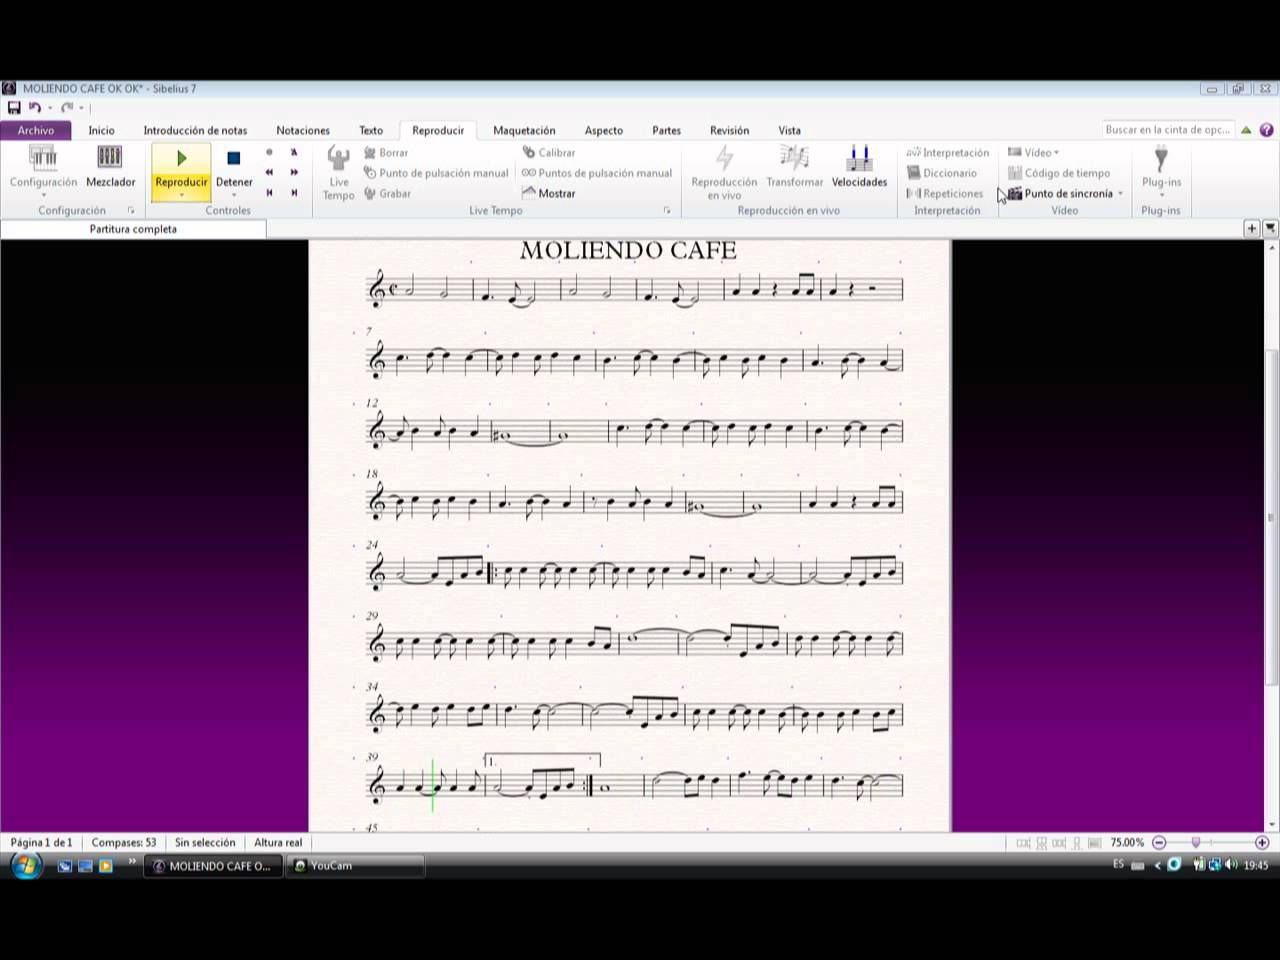 Moliendo Cafe Partitura Blank Sheet Music Sheet Music Youtube